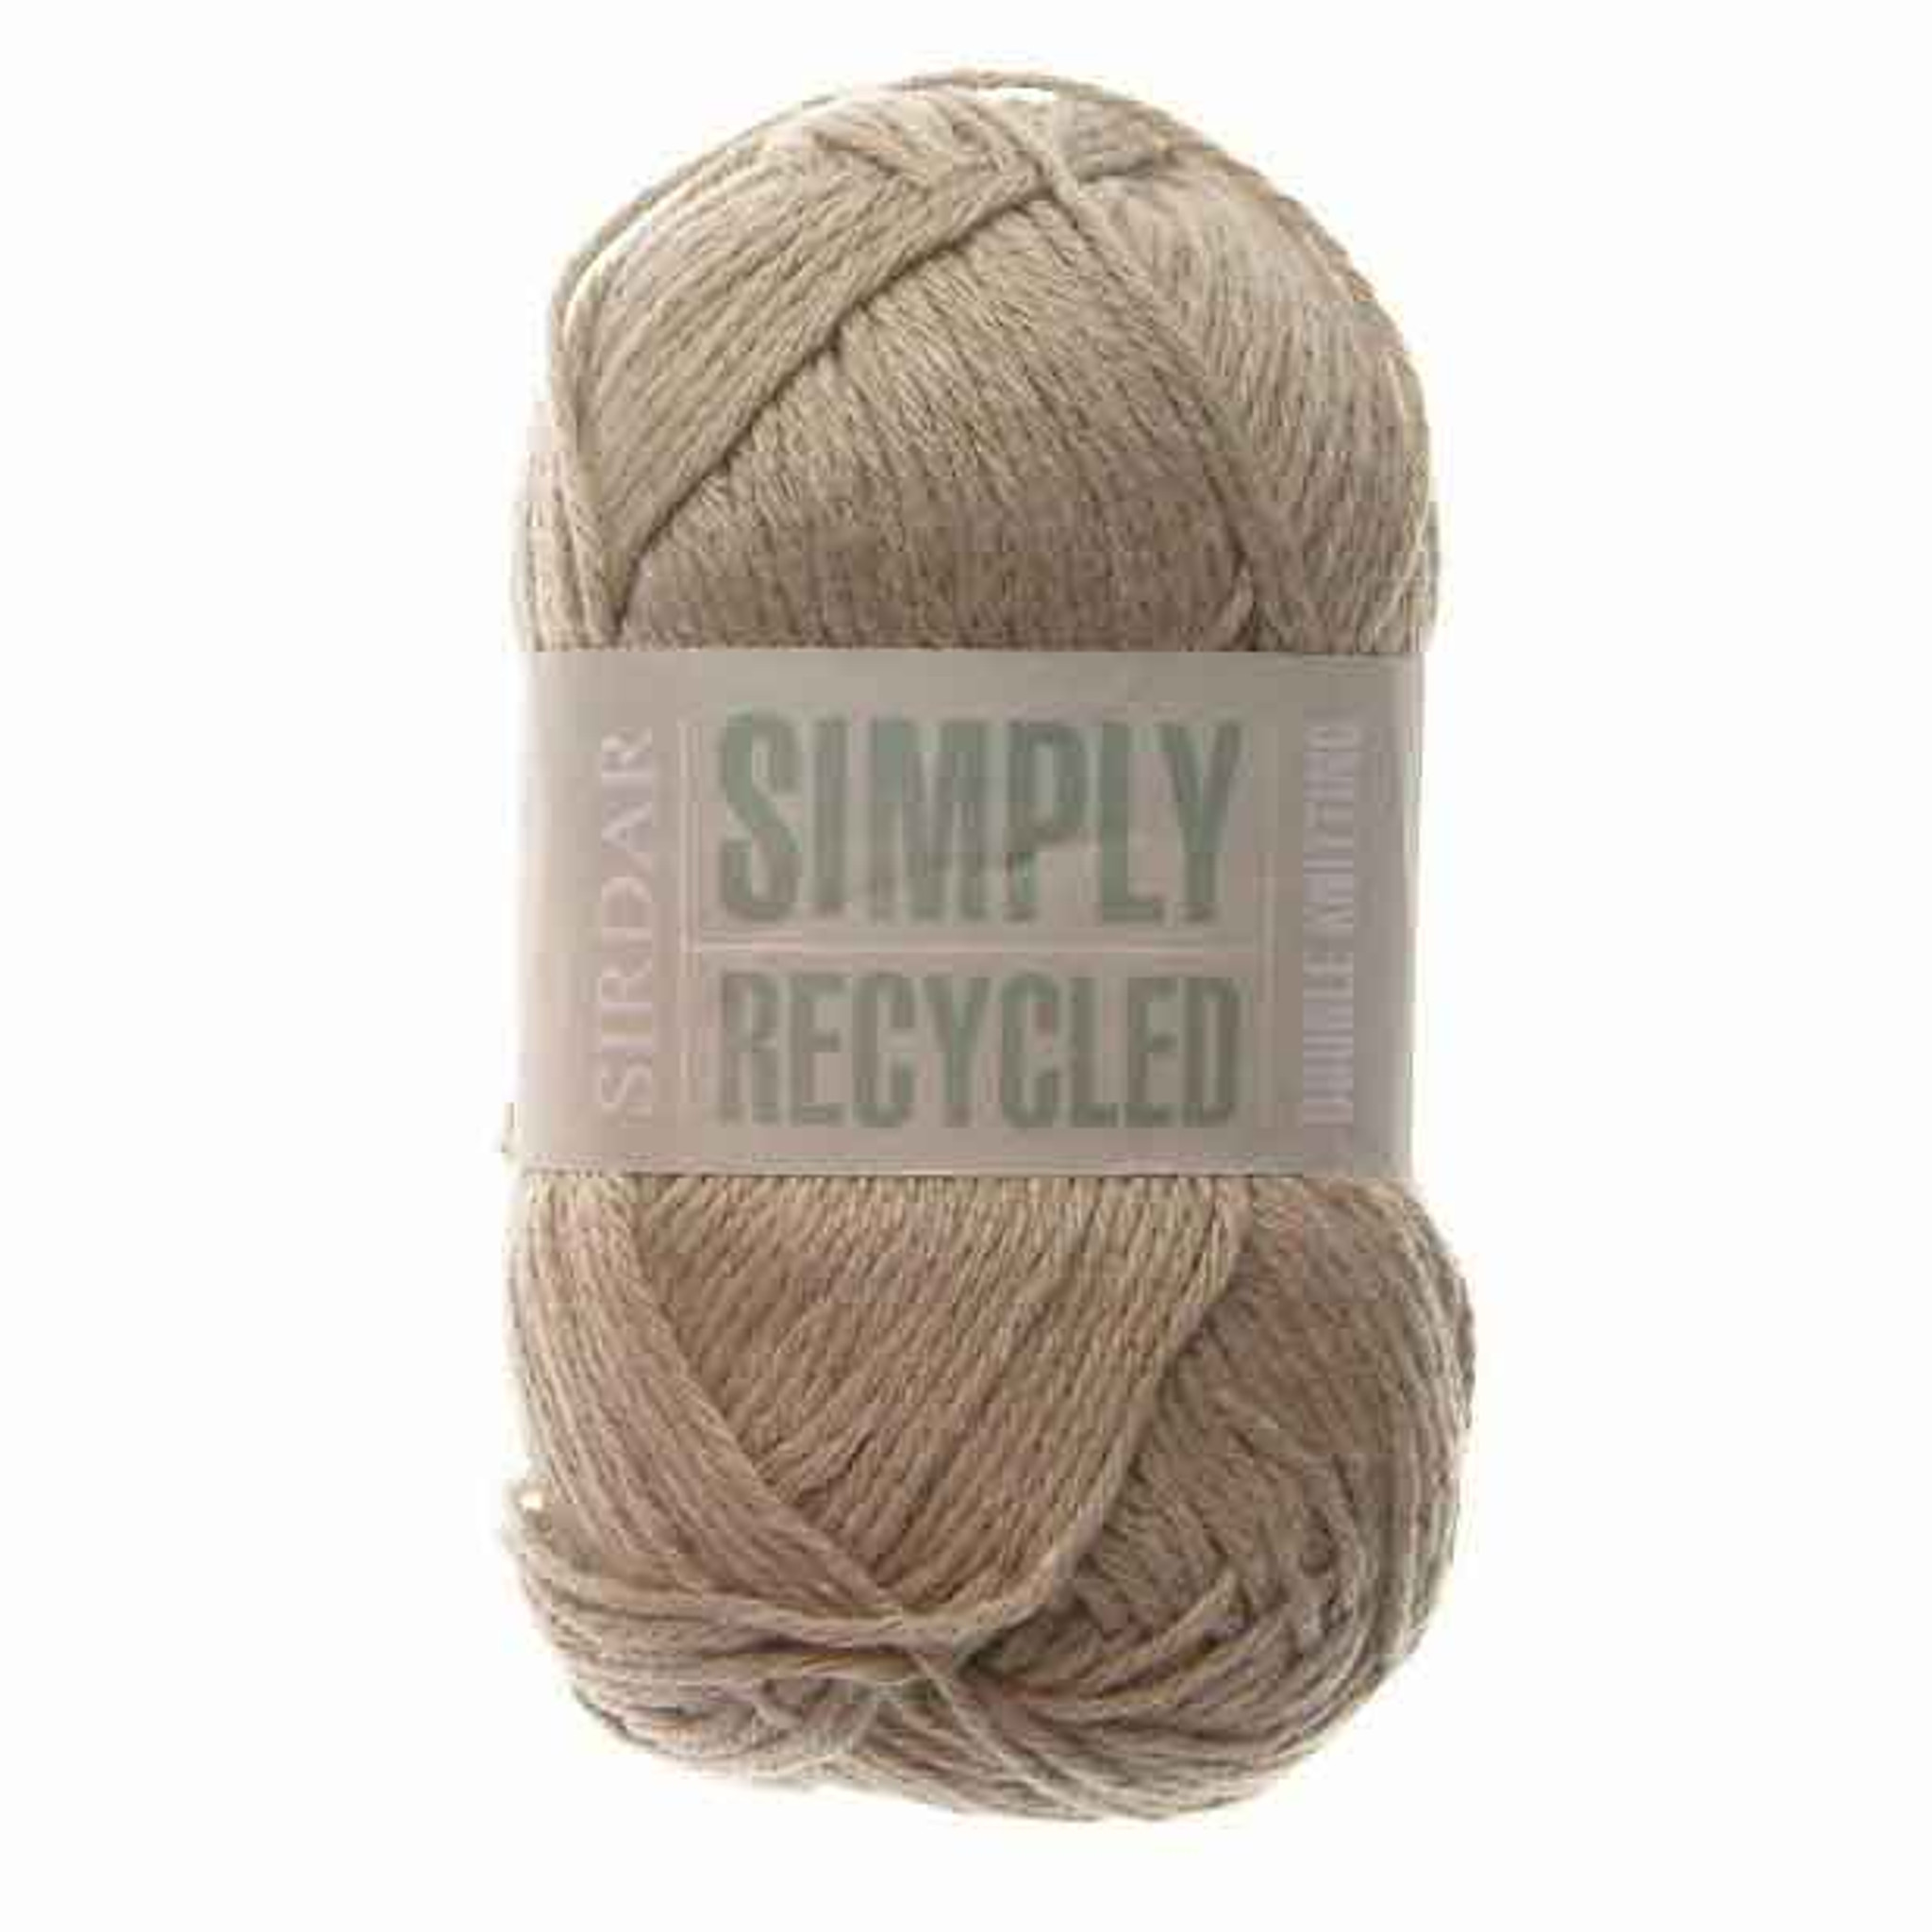 50g ball Baby Blue 4 ply knitting yarn 51/% wool 49/% acrylic VERY SOFT Light Pale